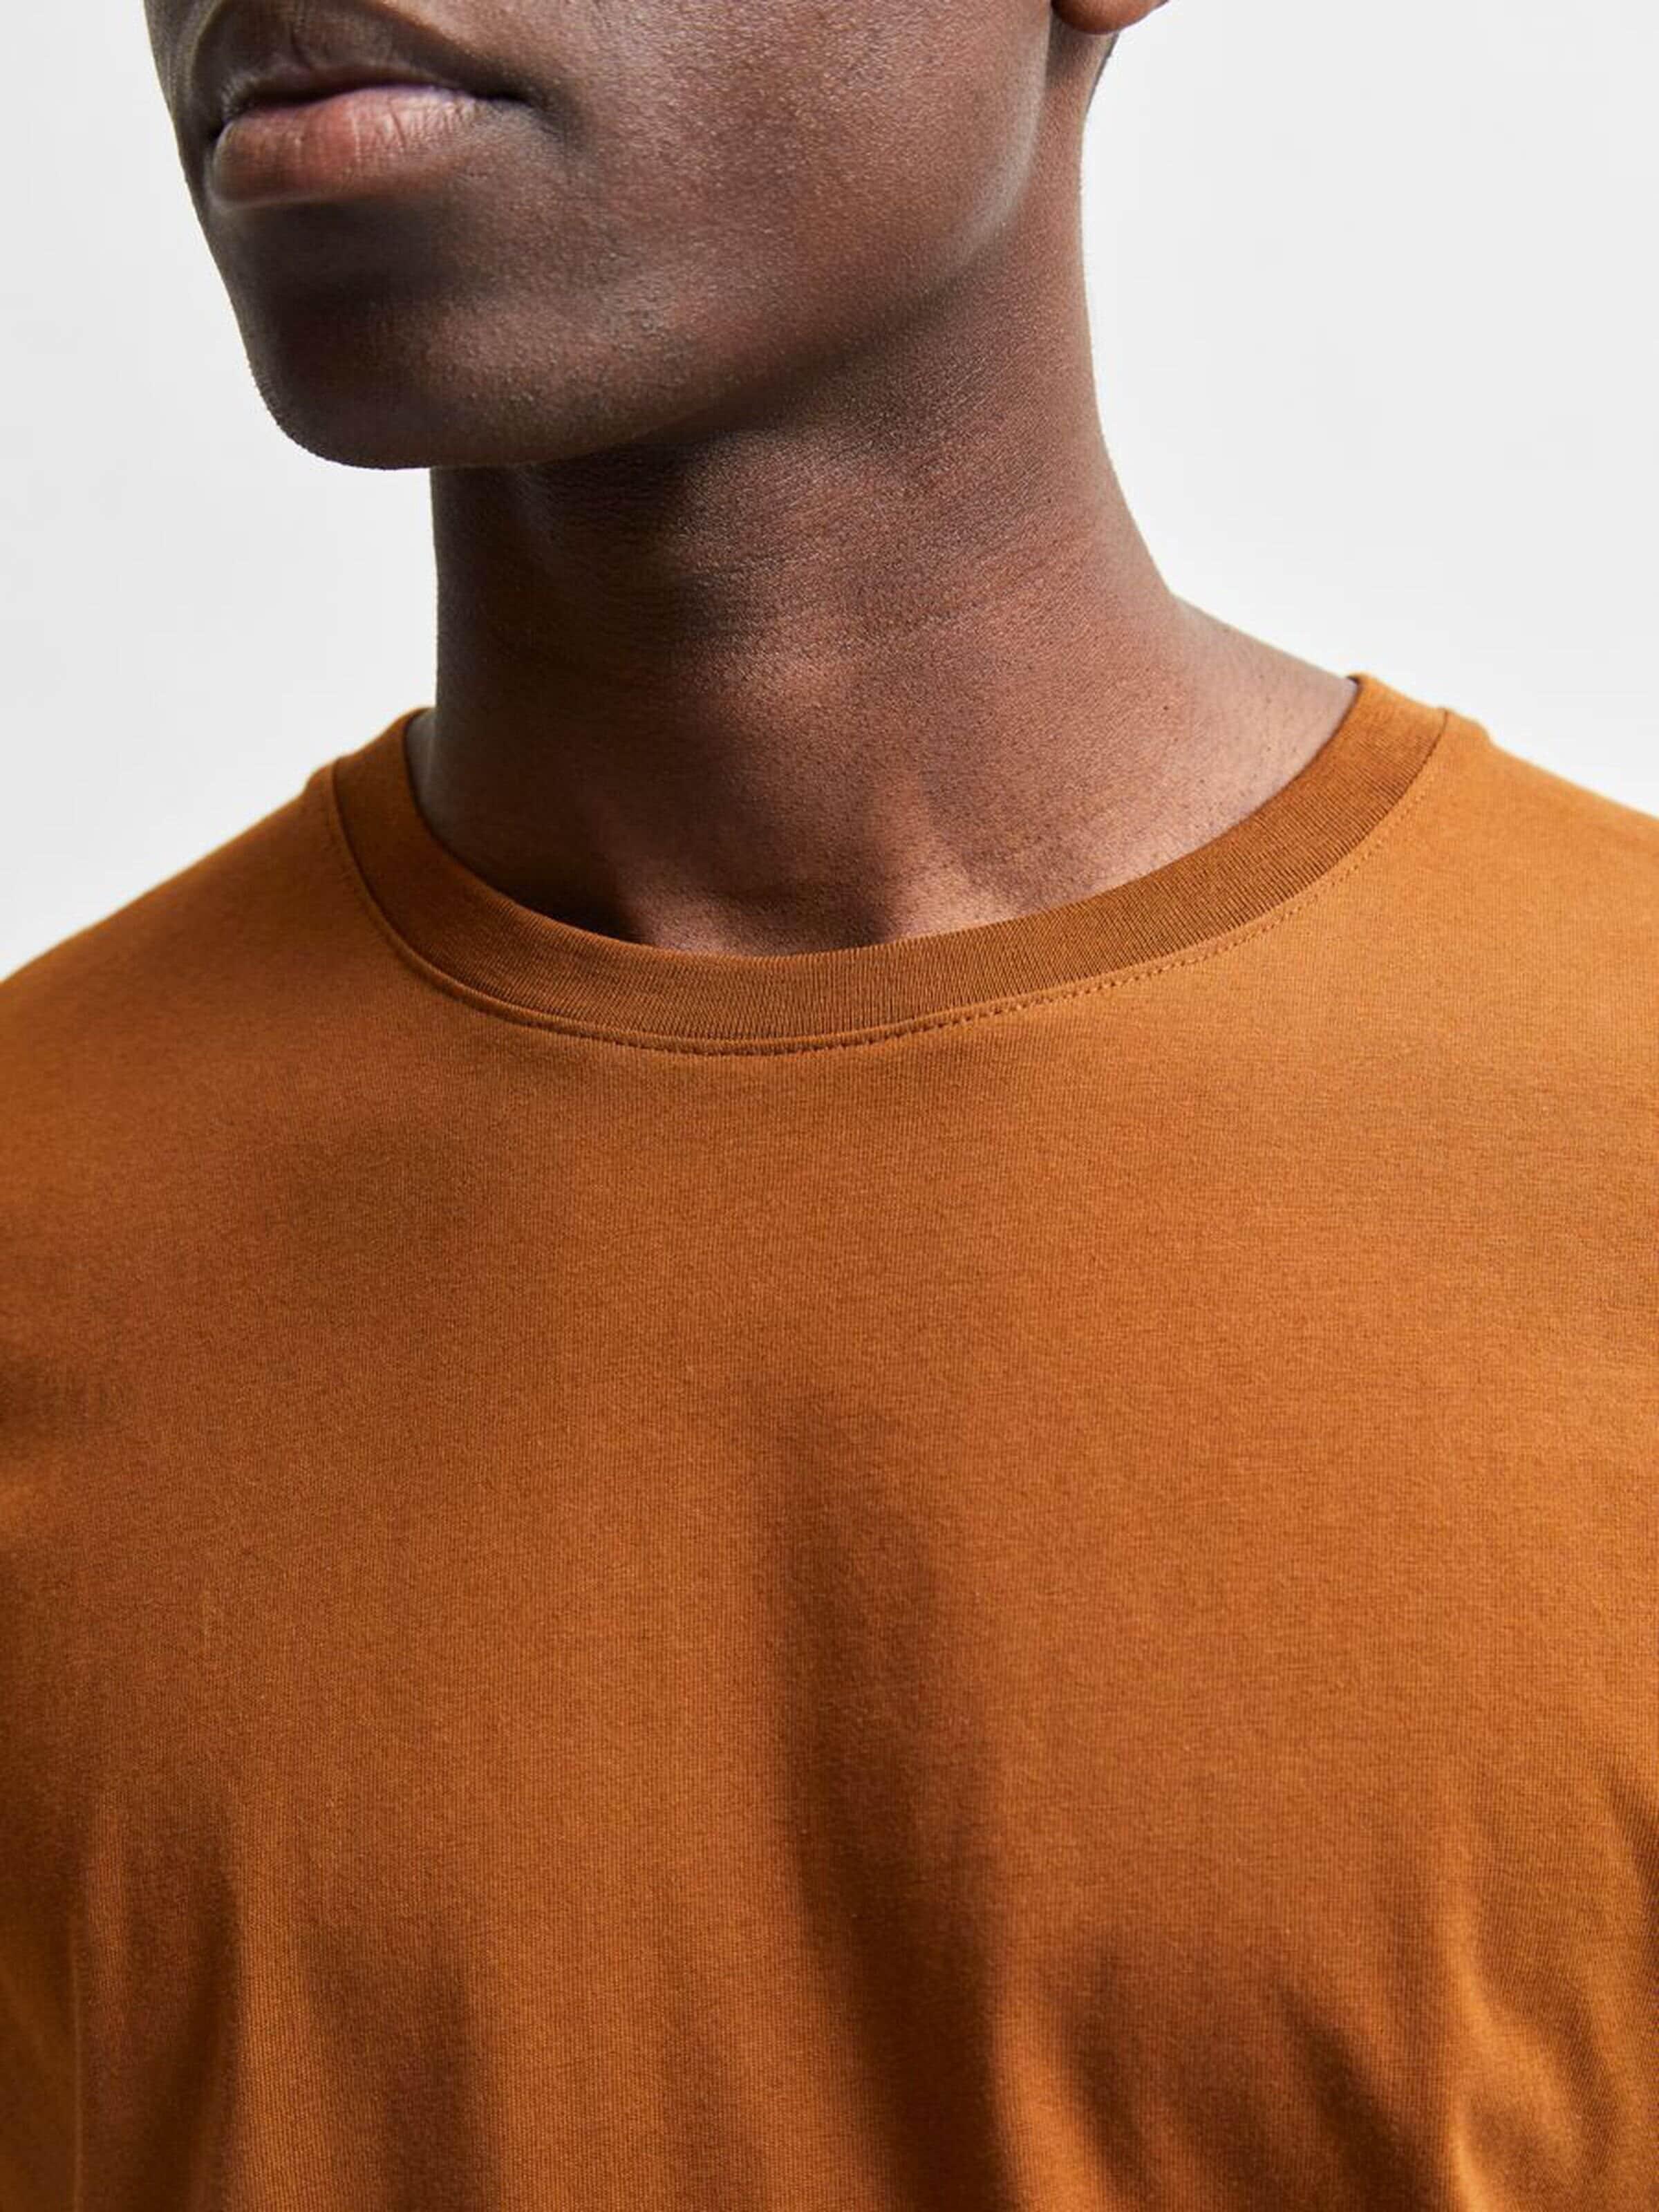 Slhnorman 180 T-Shirt - Monks Robe